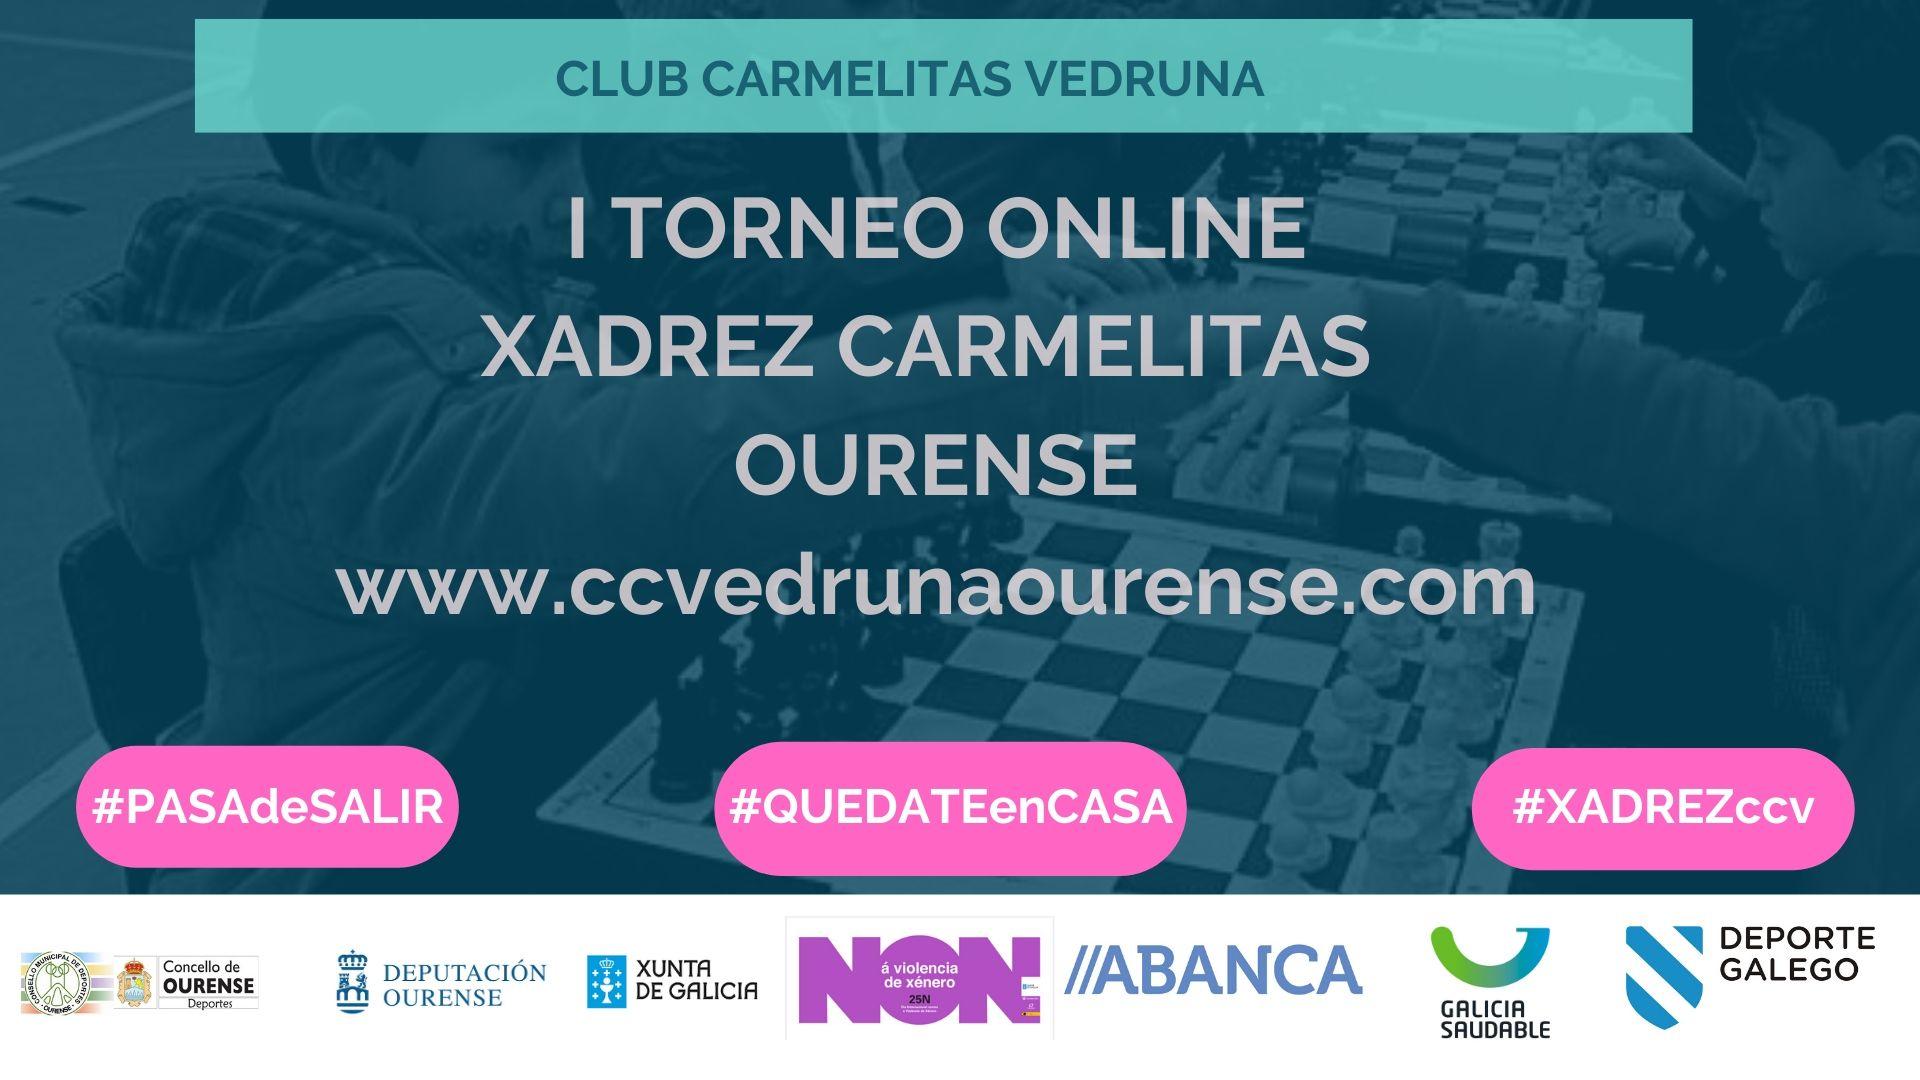 I Torneo Online Xadrez Carmelitas Ourense